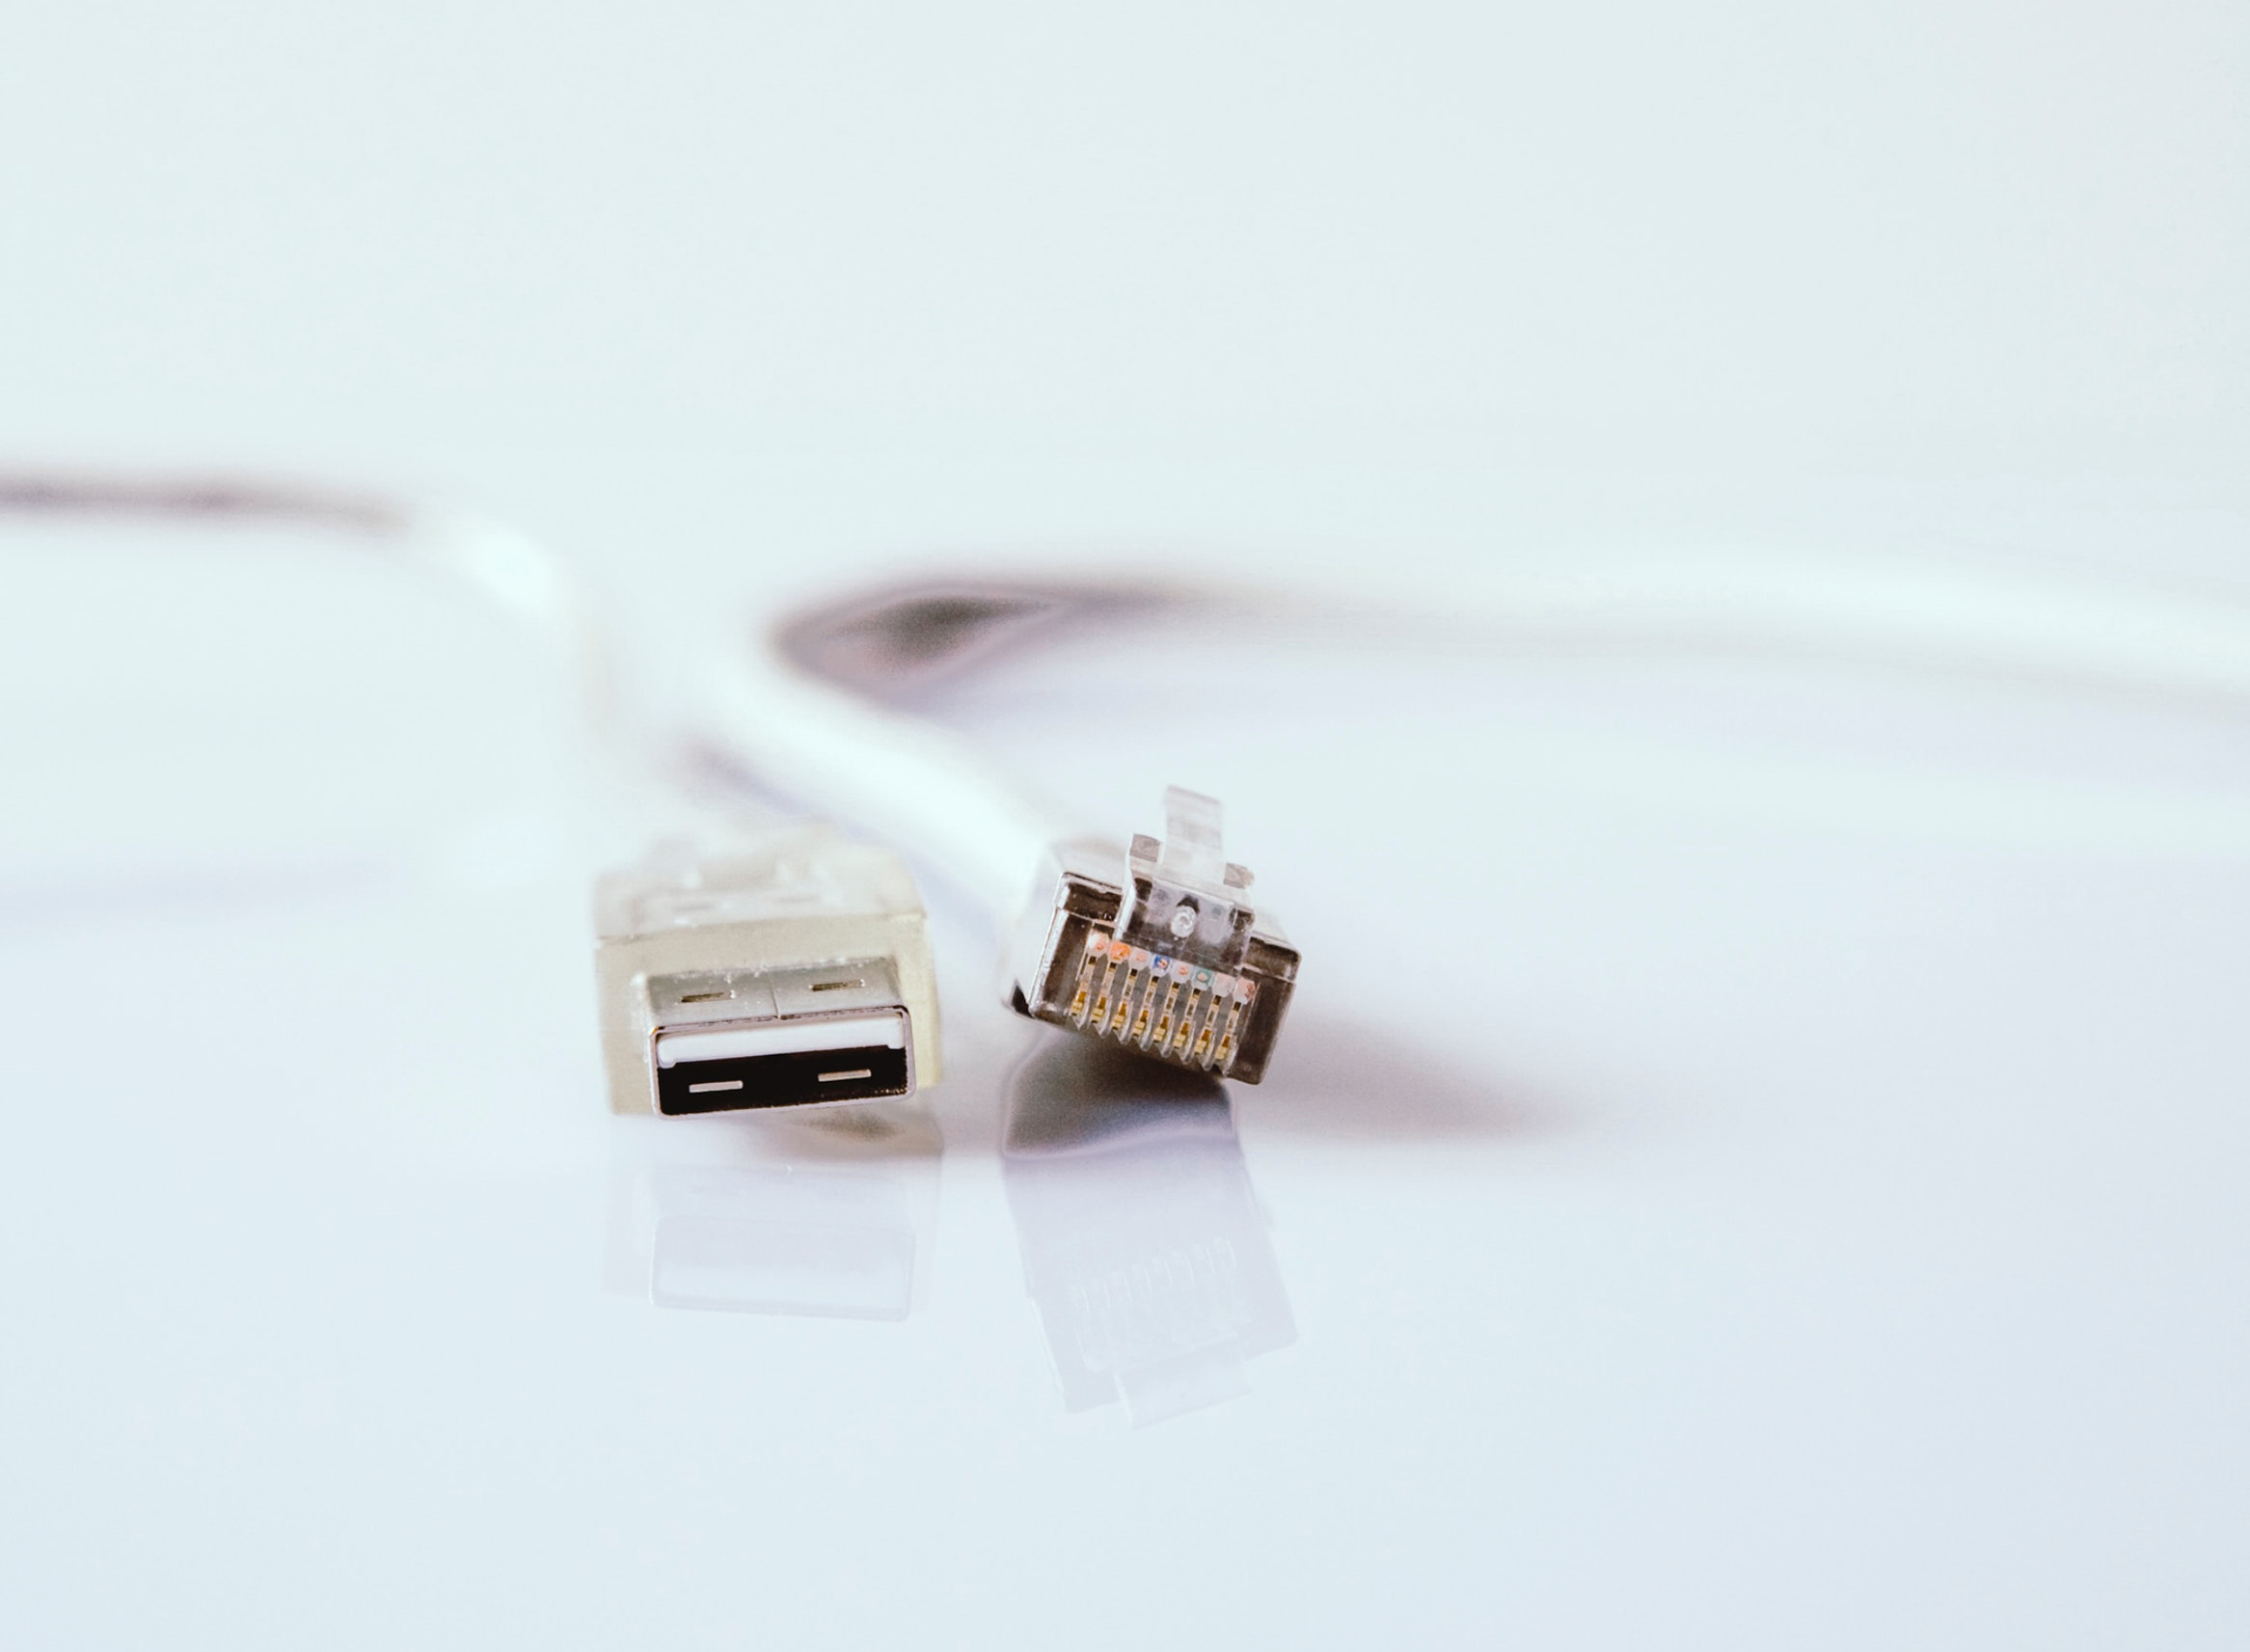 The advantages of digital services